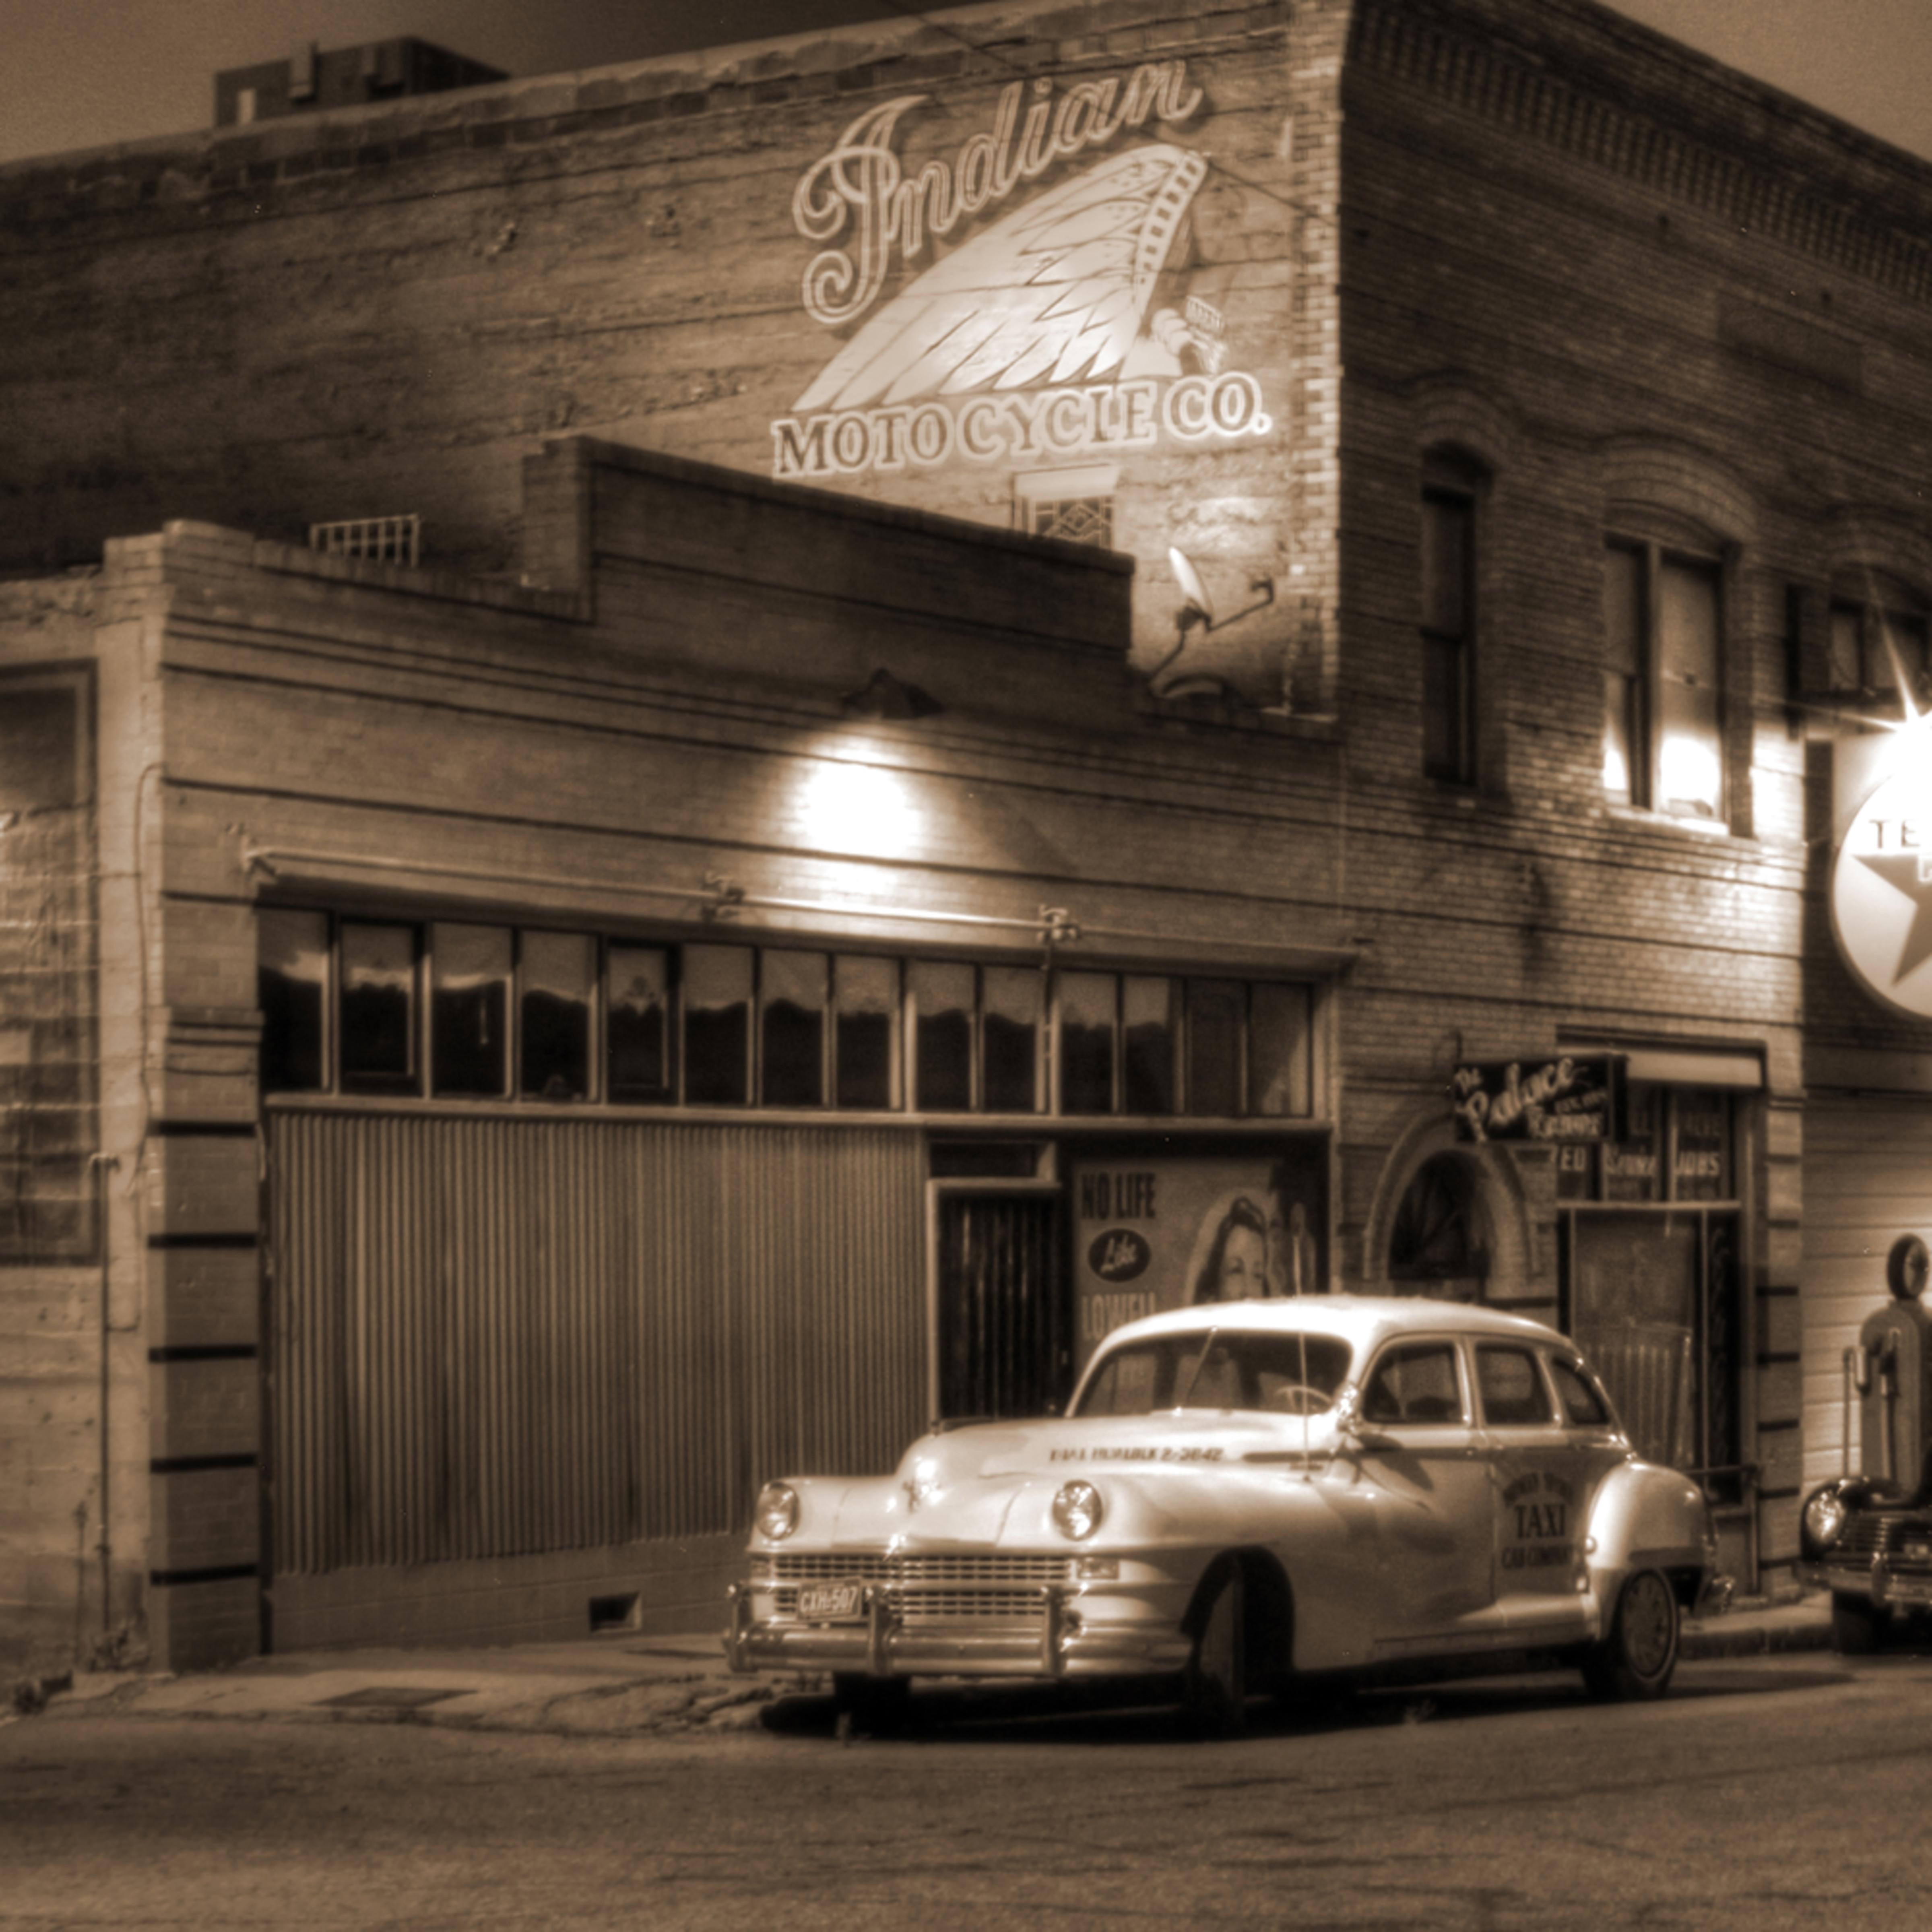 Historic lowell by night gidllb